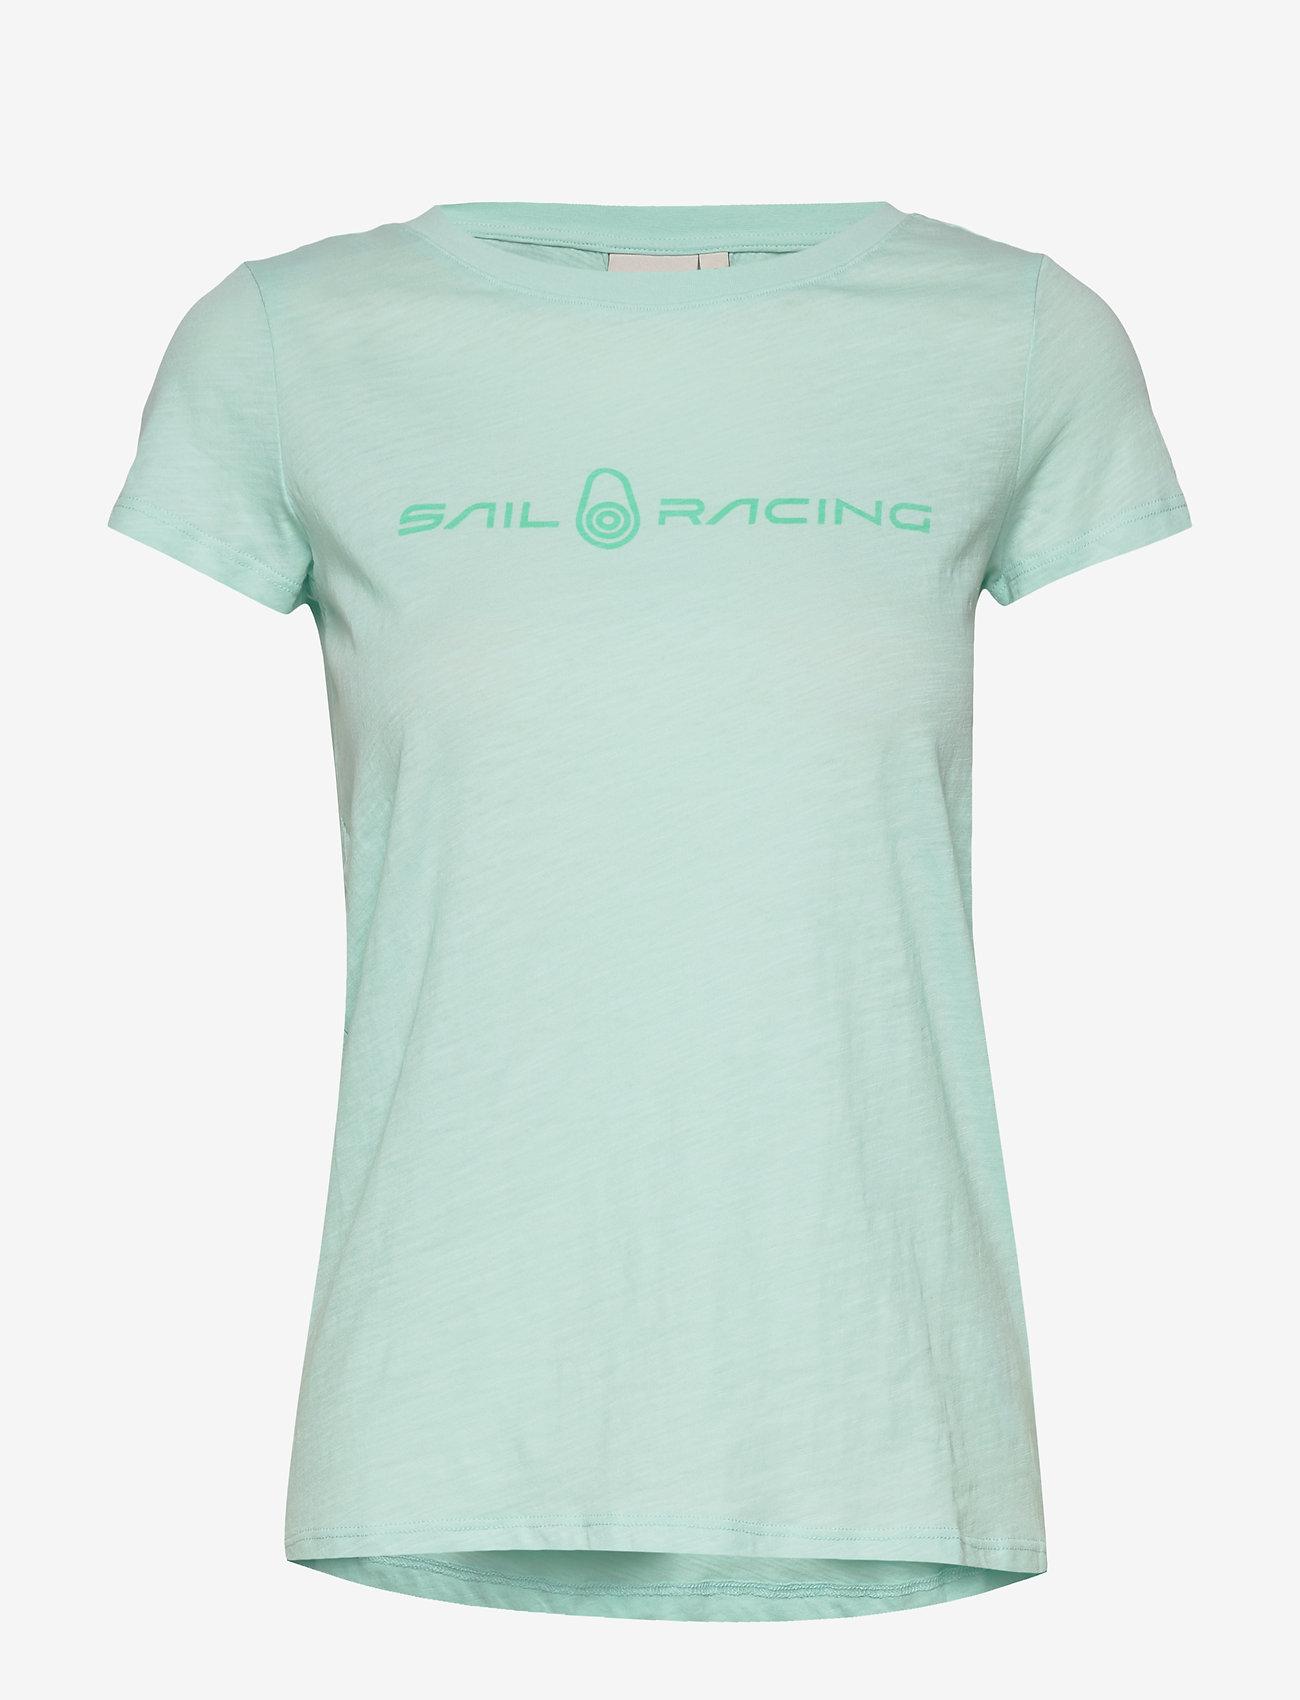 Sail Racing - W GALE TEE - t-shirts - aqua flow - 0